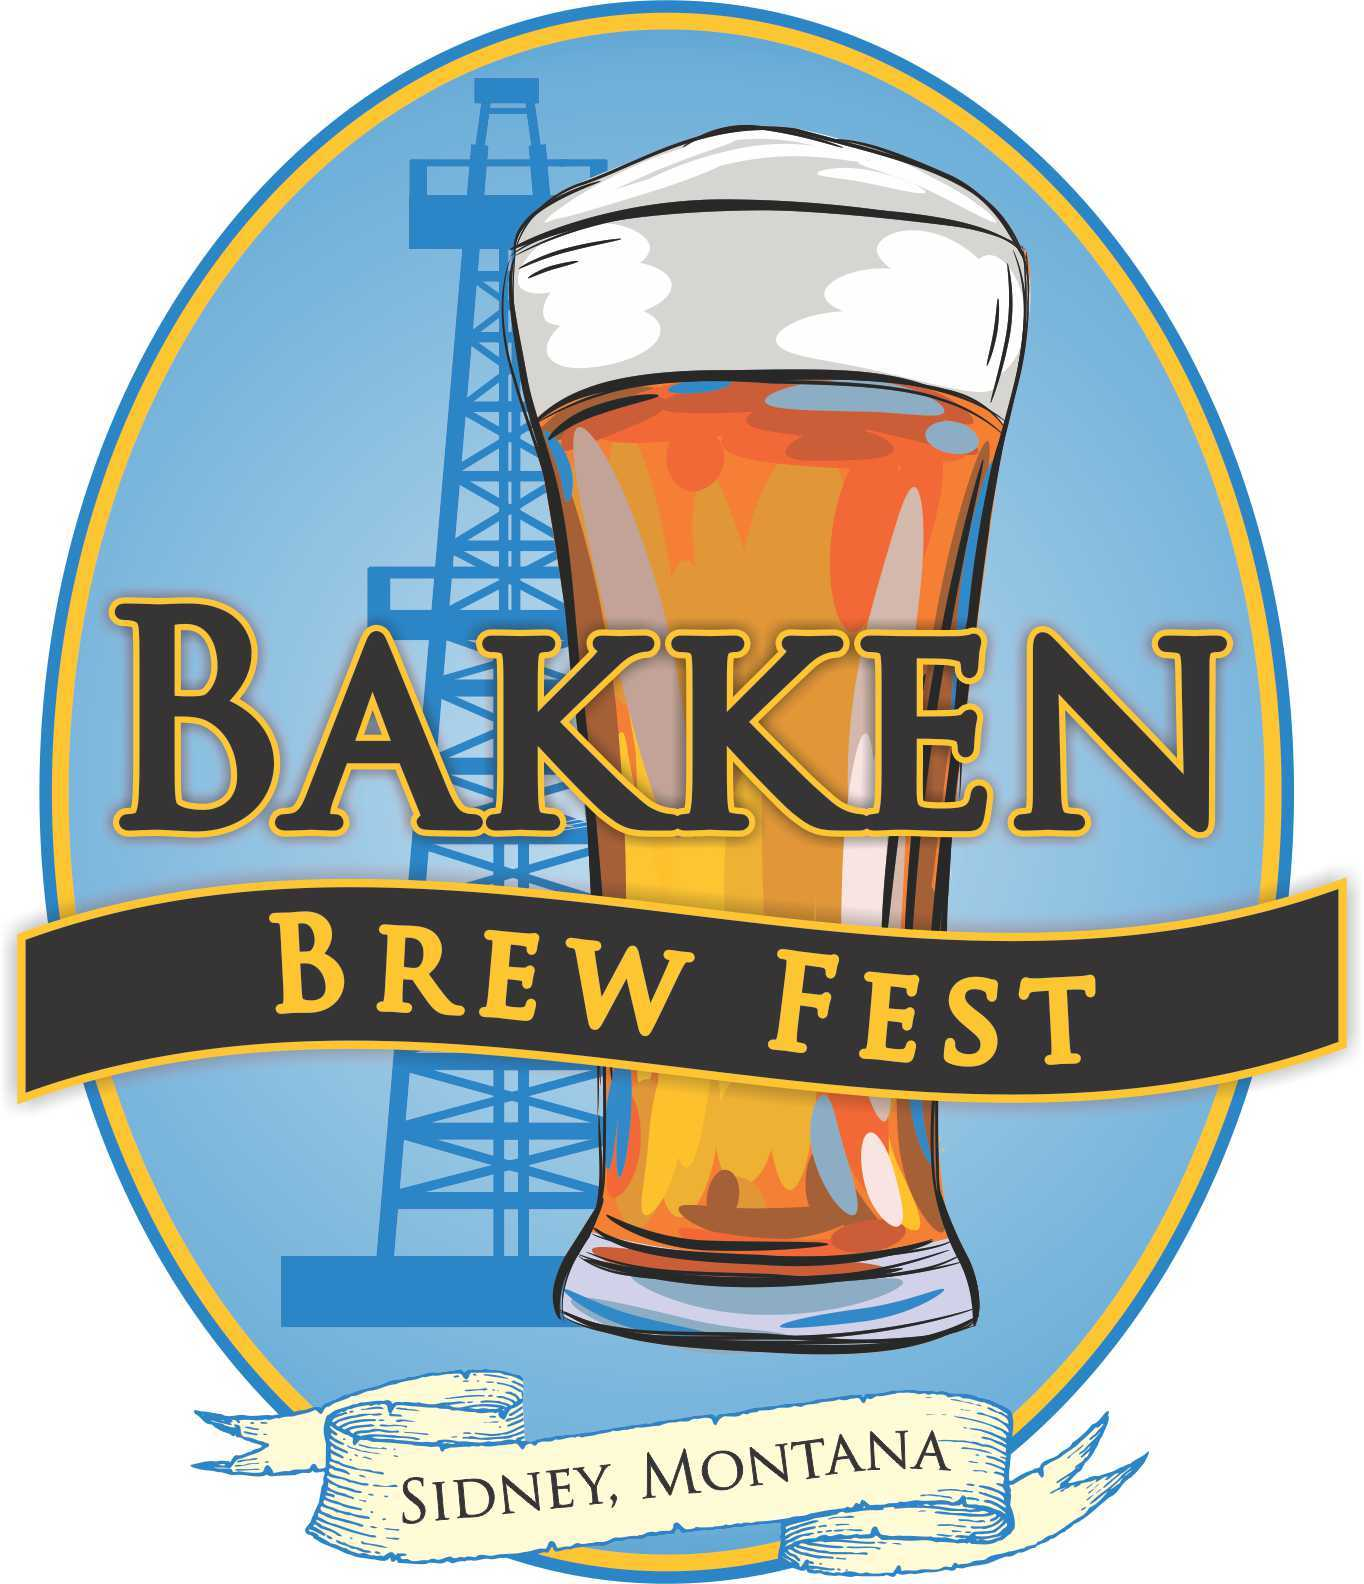 Bakken Brewfest Logo